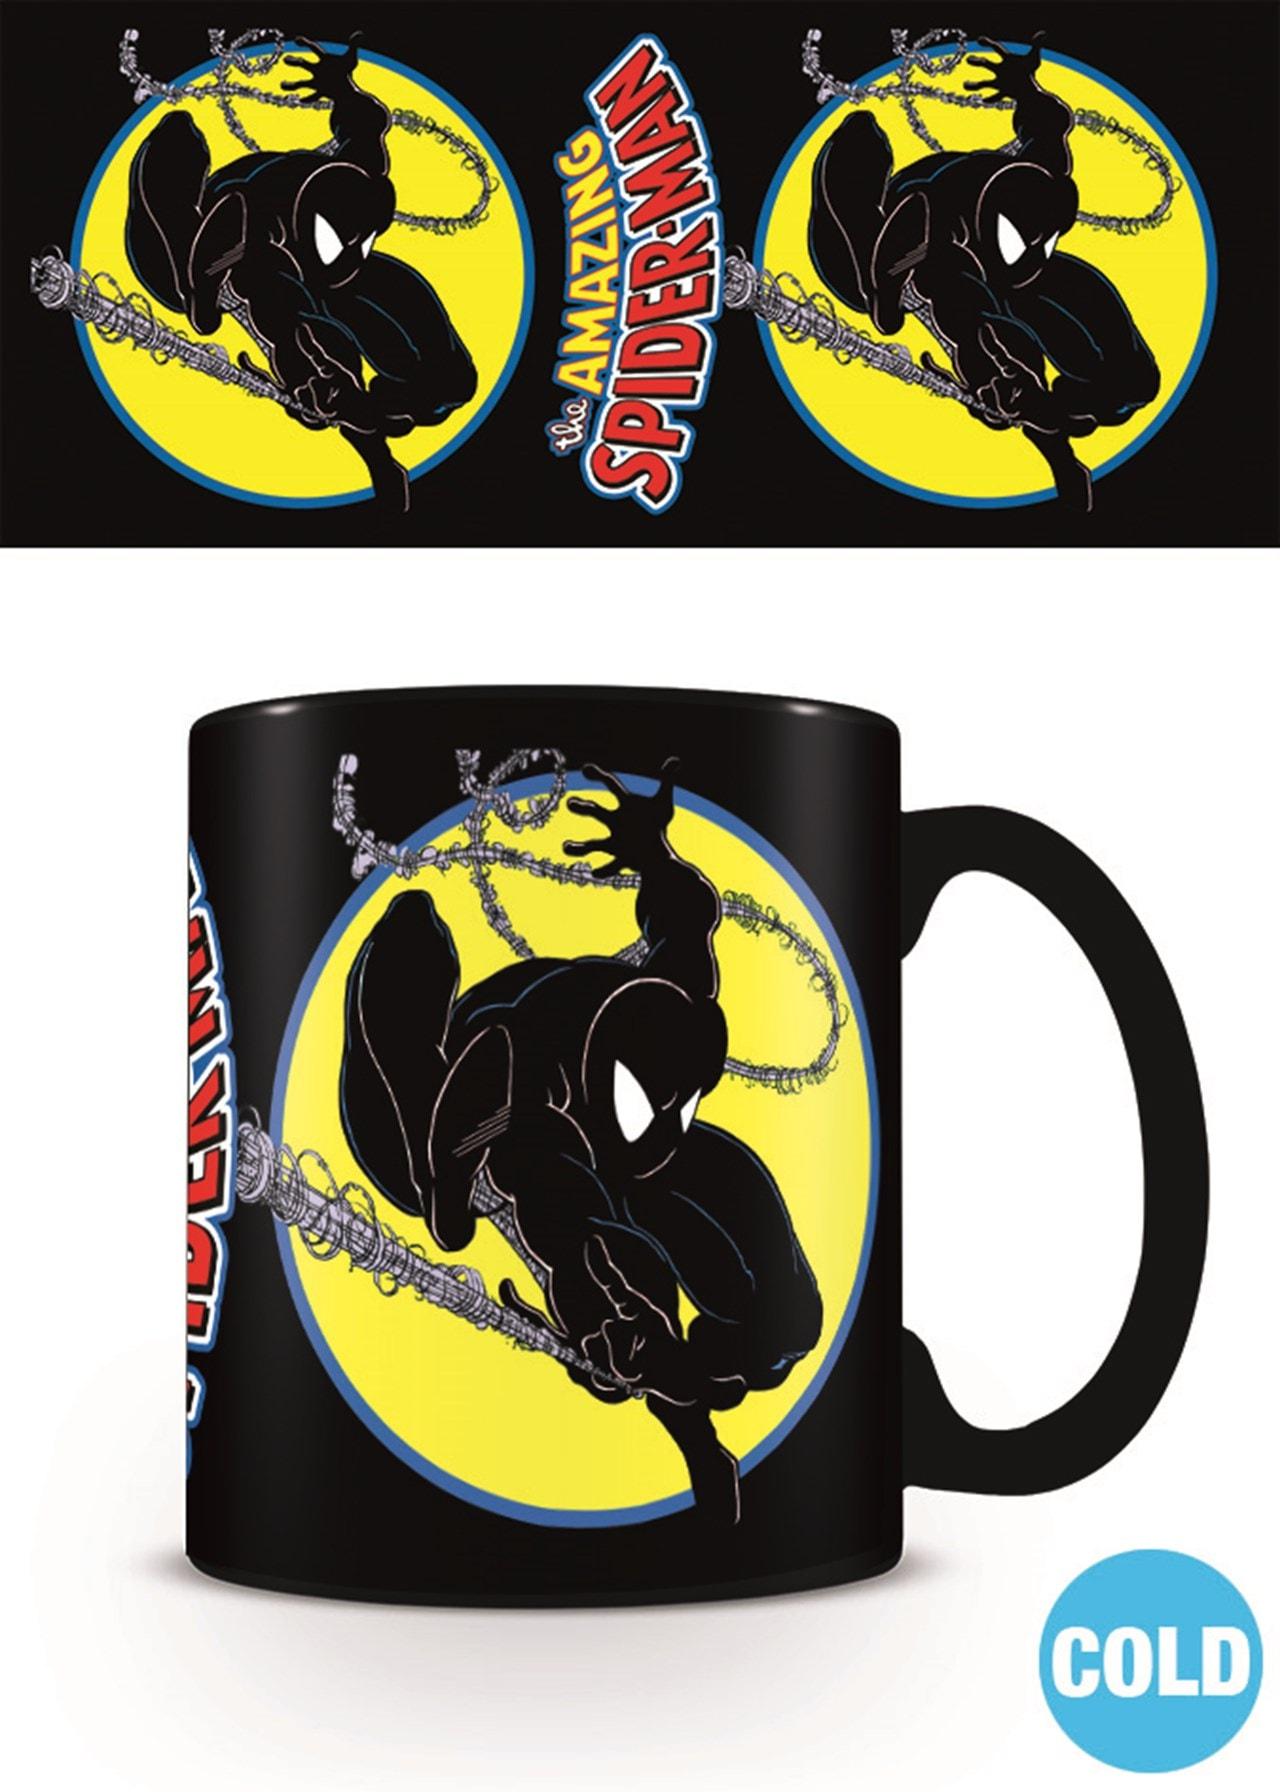 Marvel Comics: Spiderman Iconic Issue Heat Changing Mug - 2